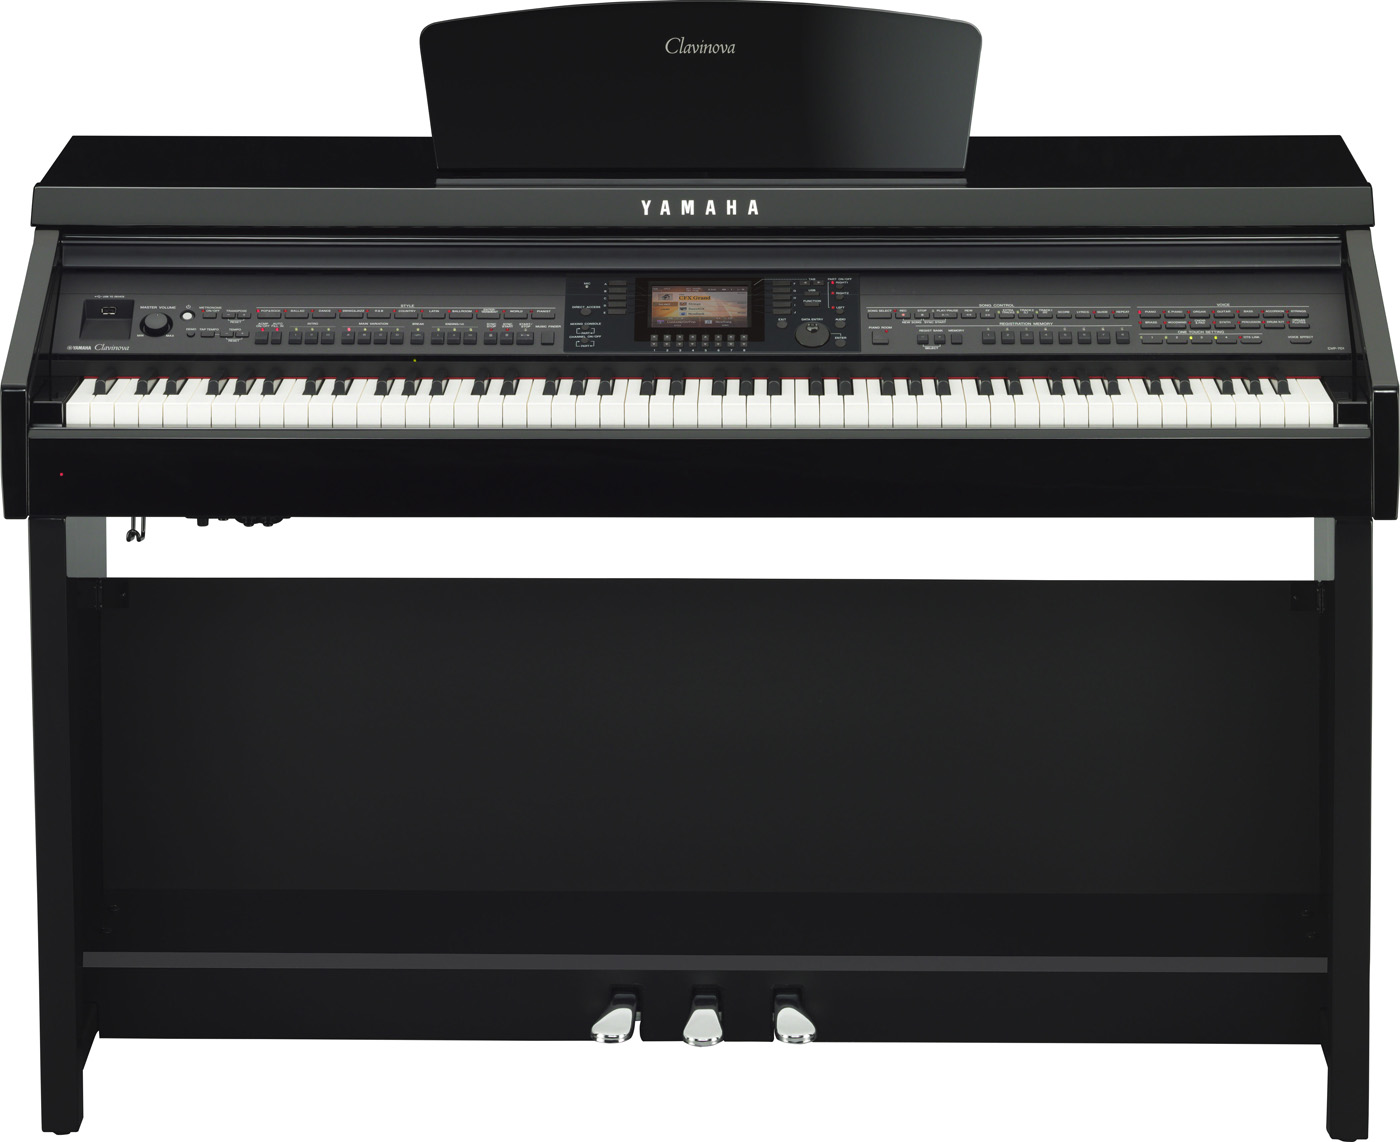 Yamaha Clavinova CVP 701 schwarz poliert